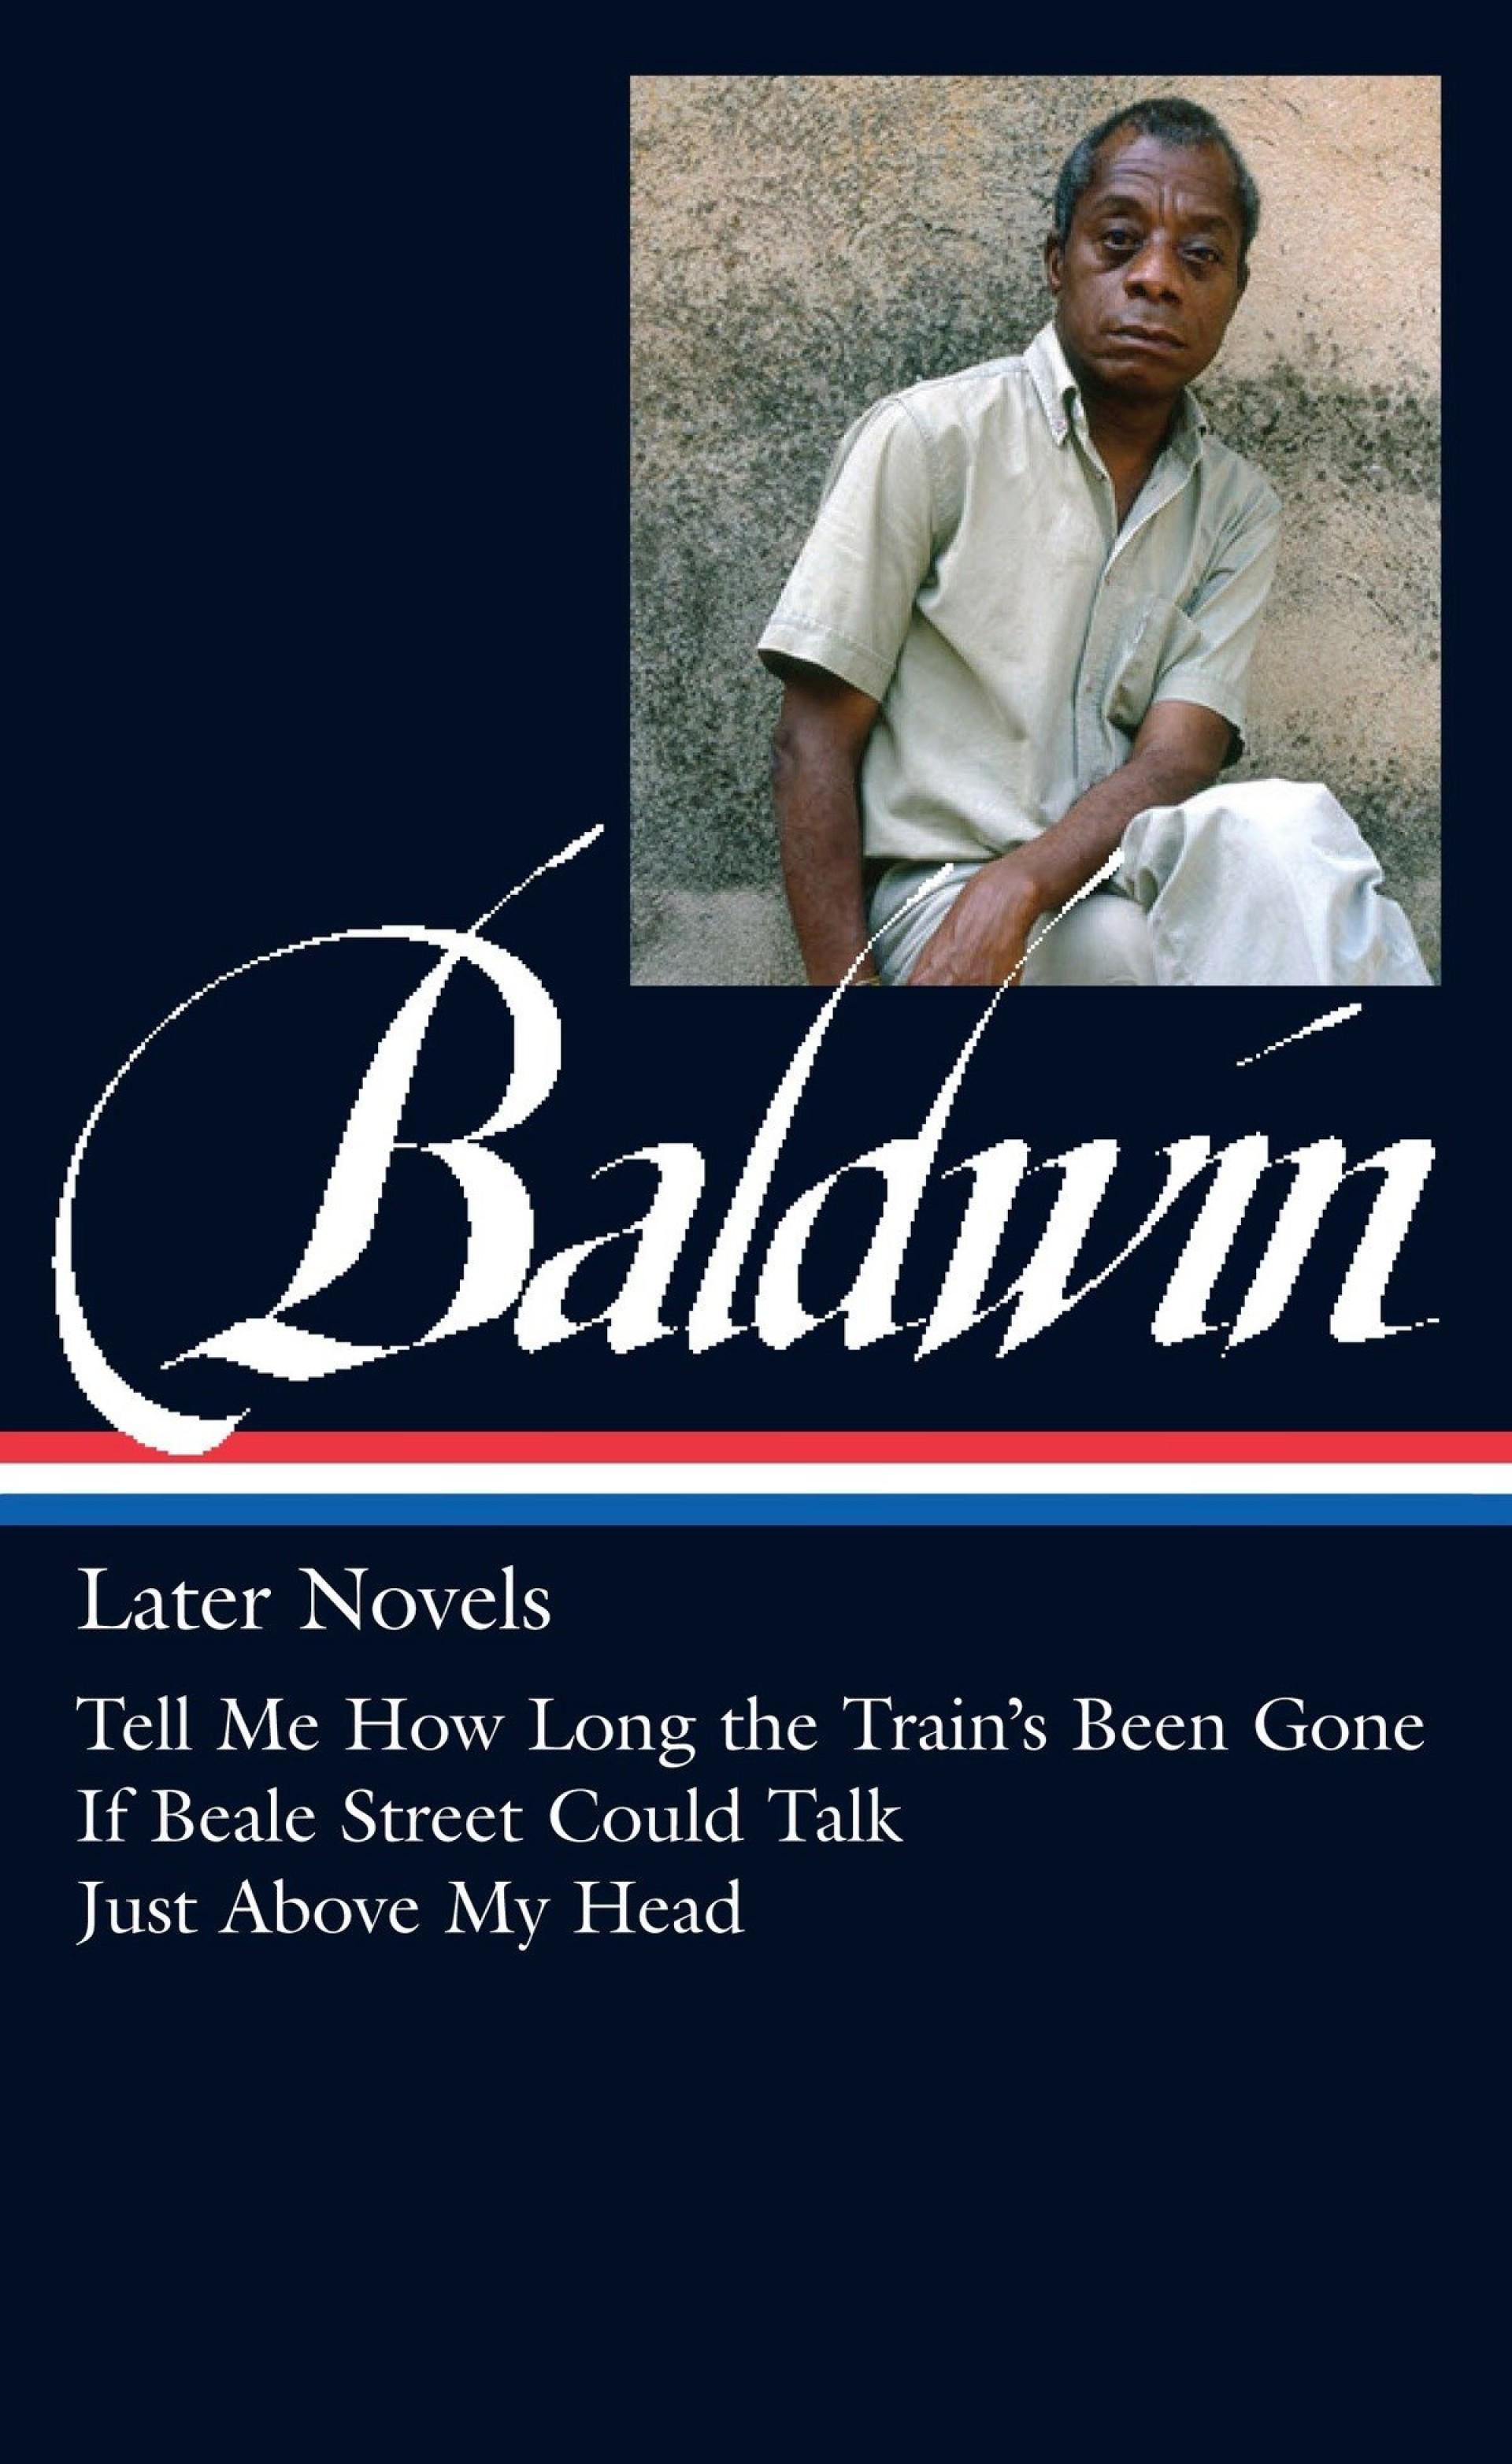 022 James Baldwin Collected Essays 81v0yxj44el Essay Wondrous Table Of Contents Ebook Google Books 1920